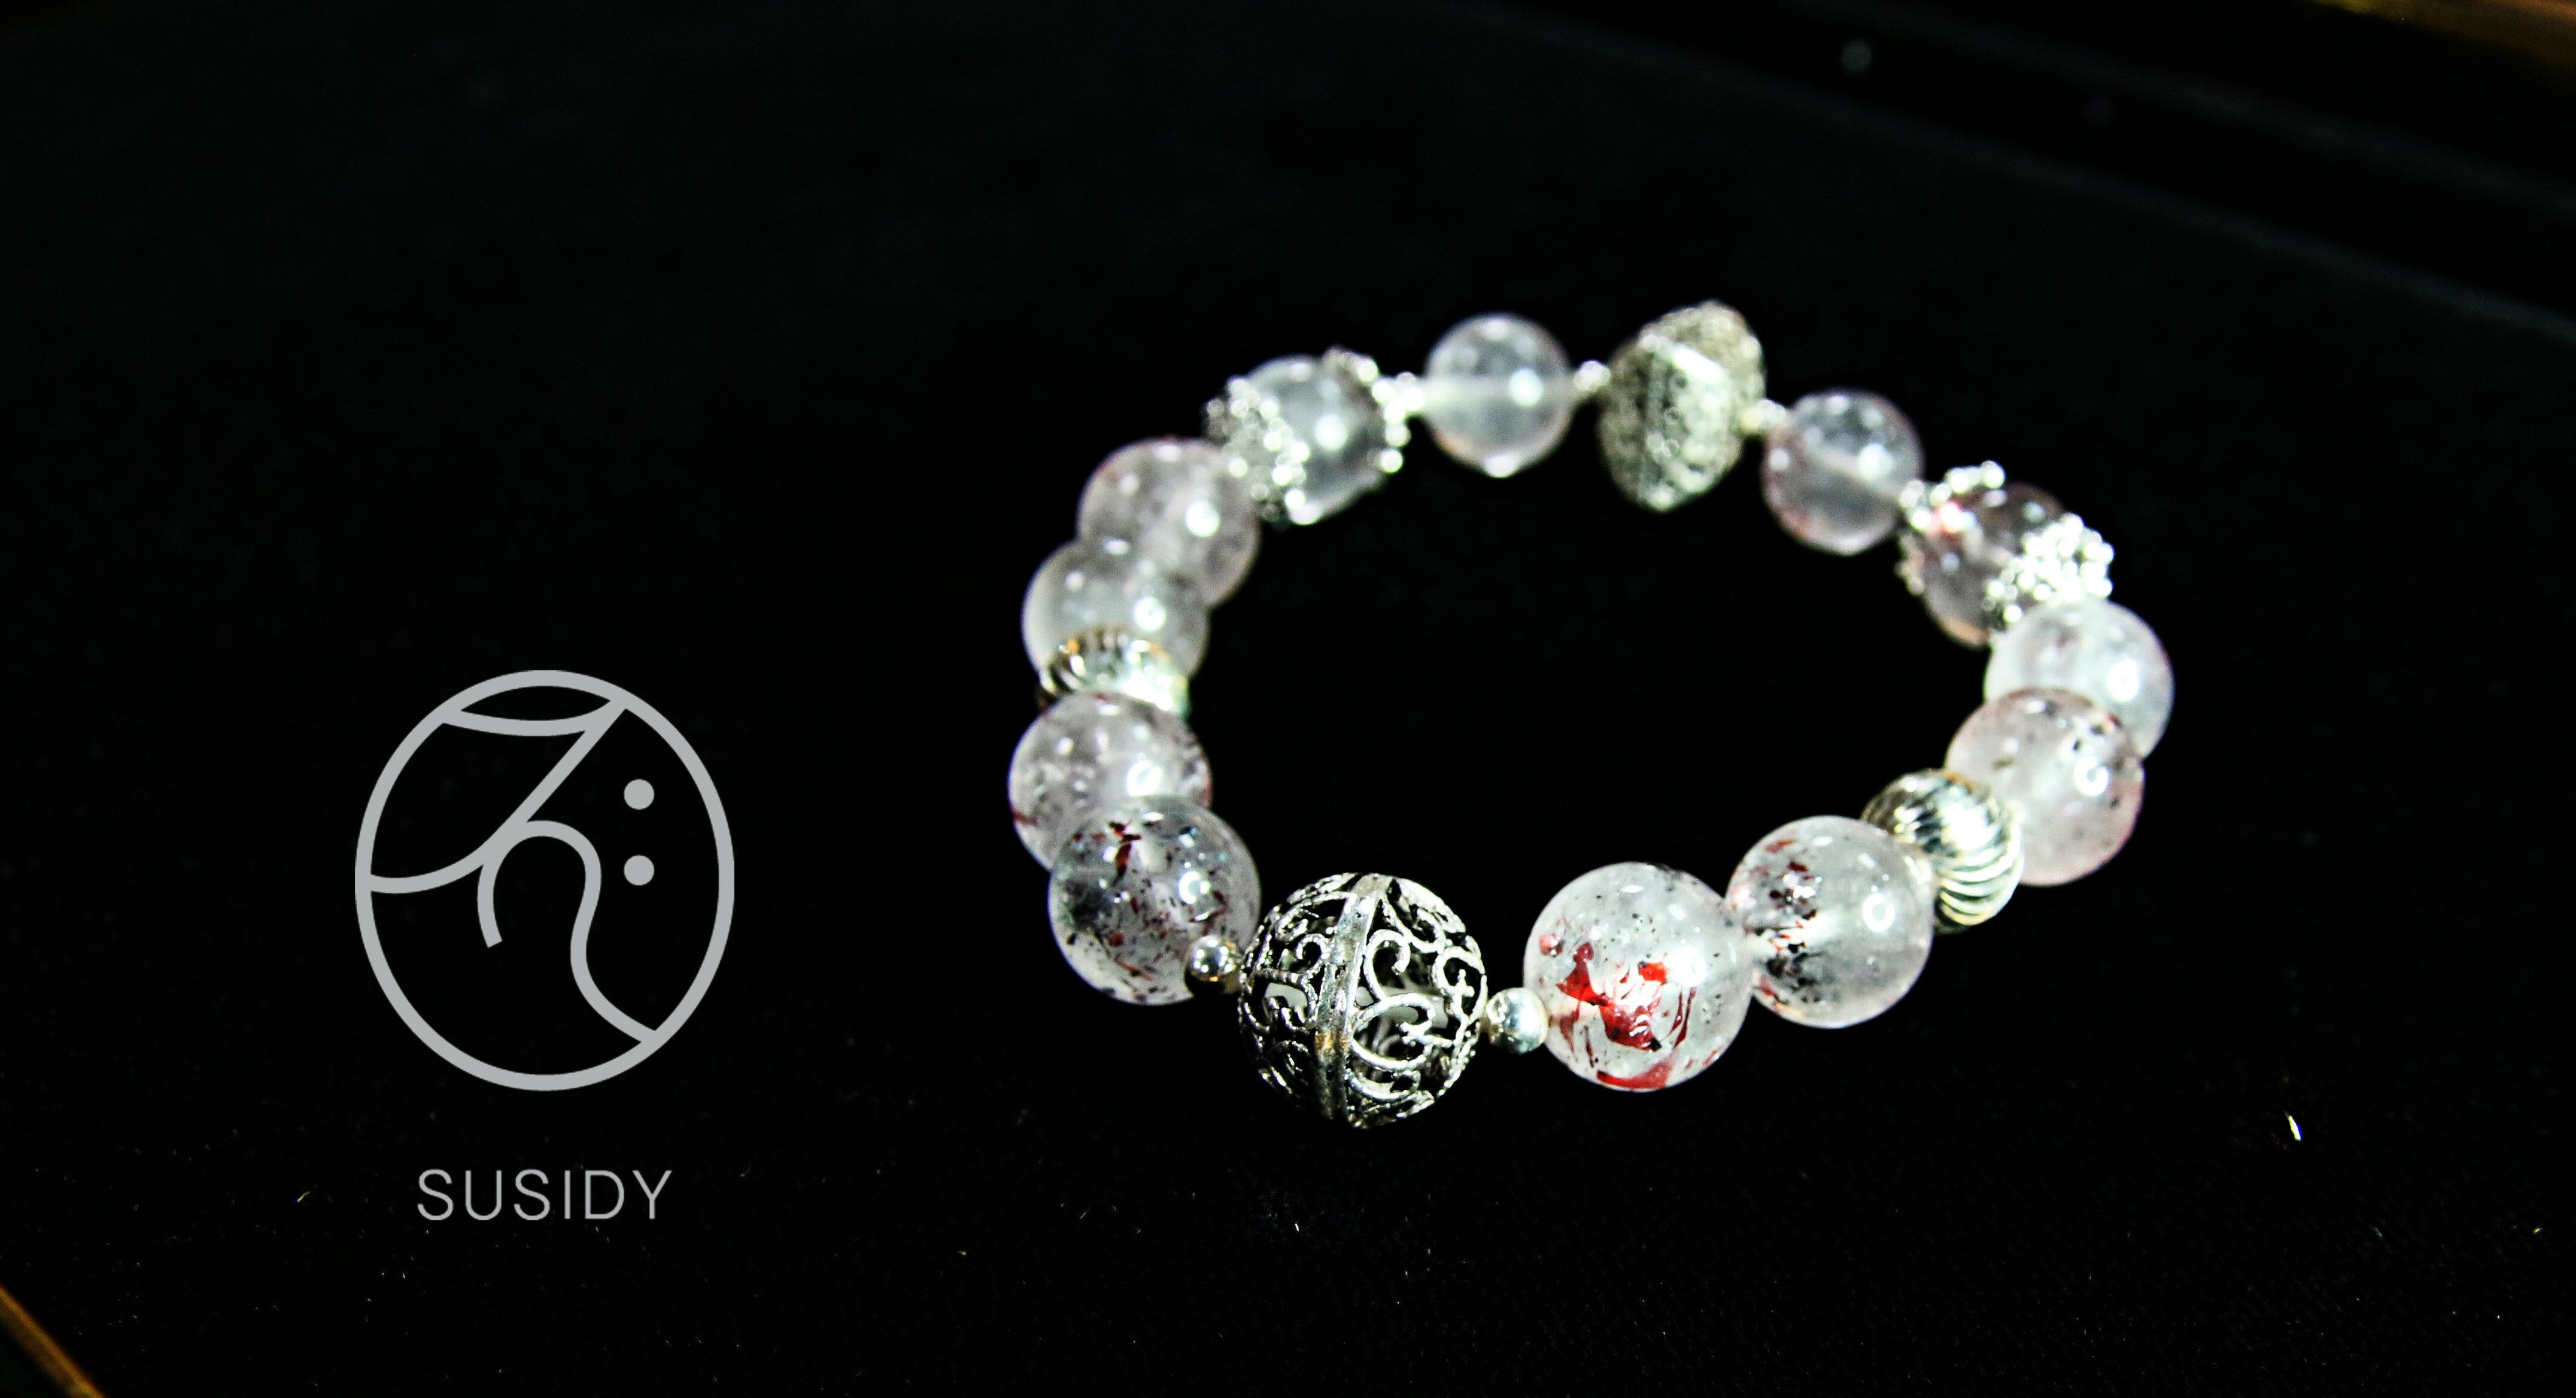 SusidyDesign ~ 超級七 Superseven 手珠 銀飾